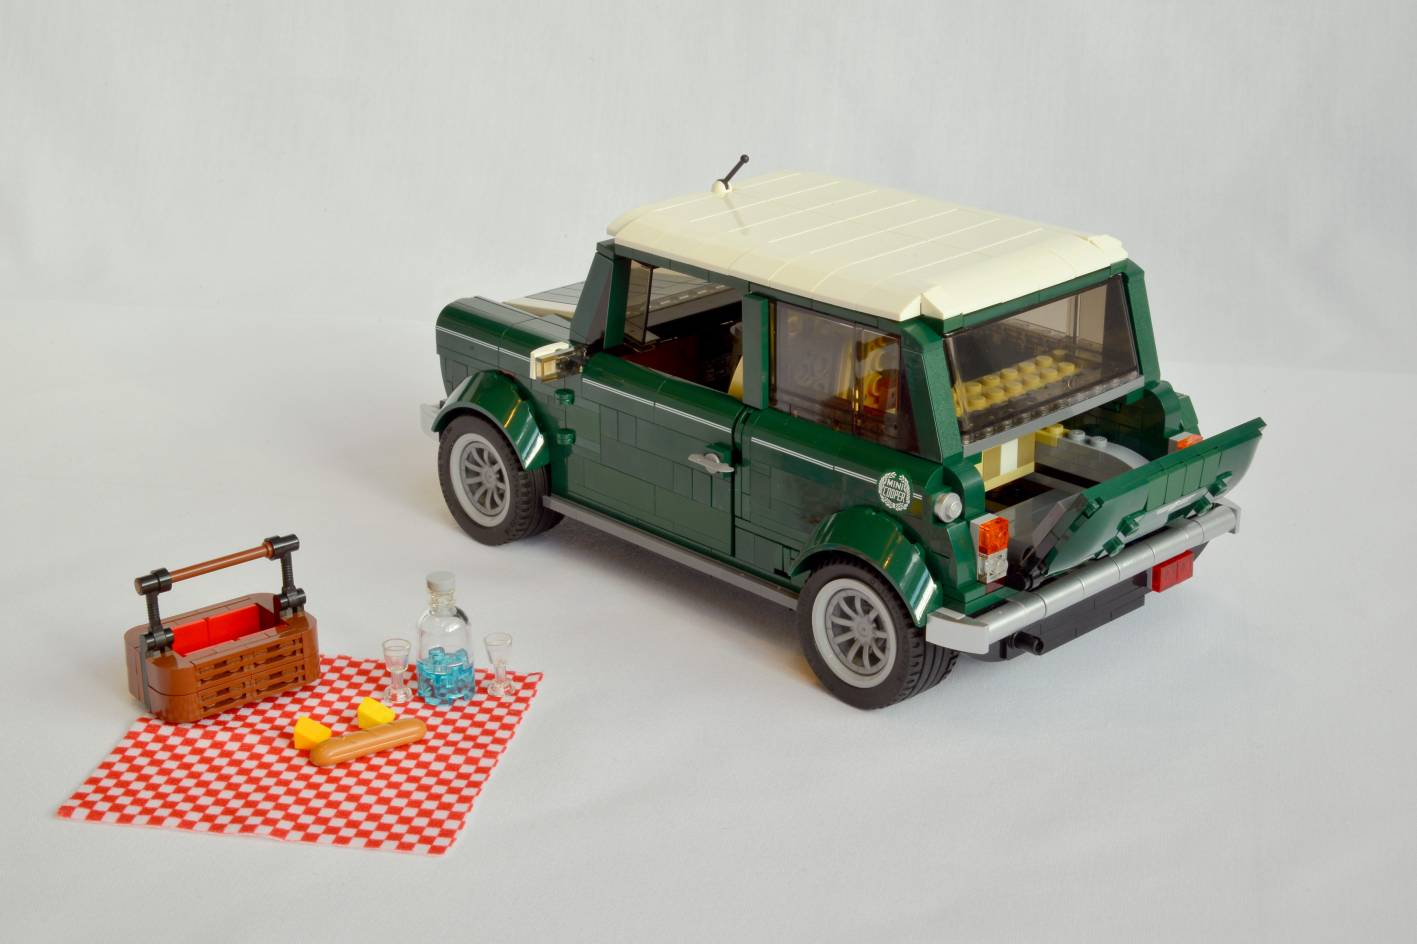 lego adds mini cooper to creator expert series. Black Bedroom Furniture Sets. Home Design Ideas